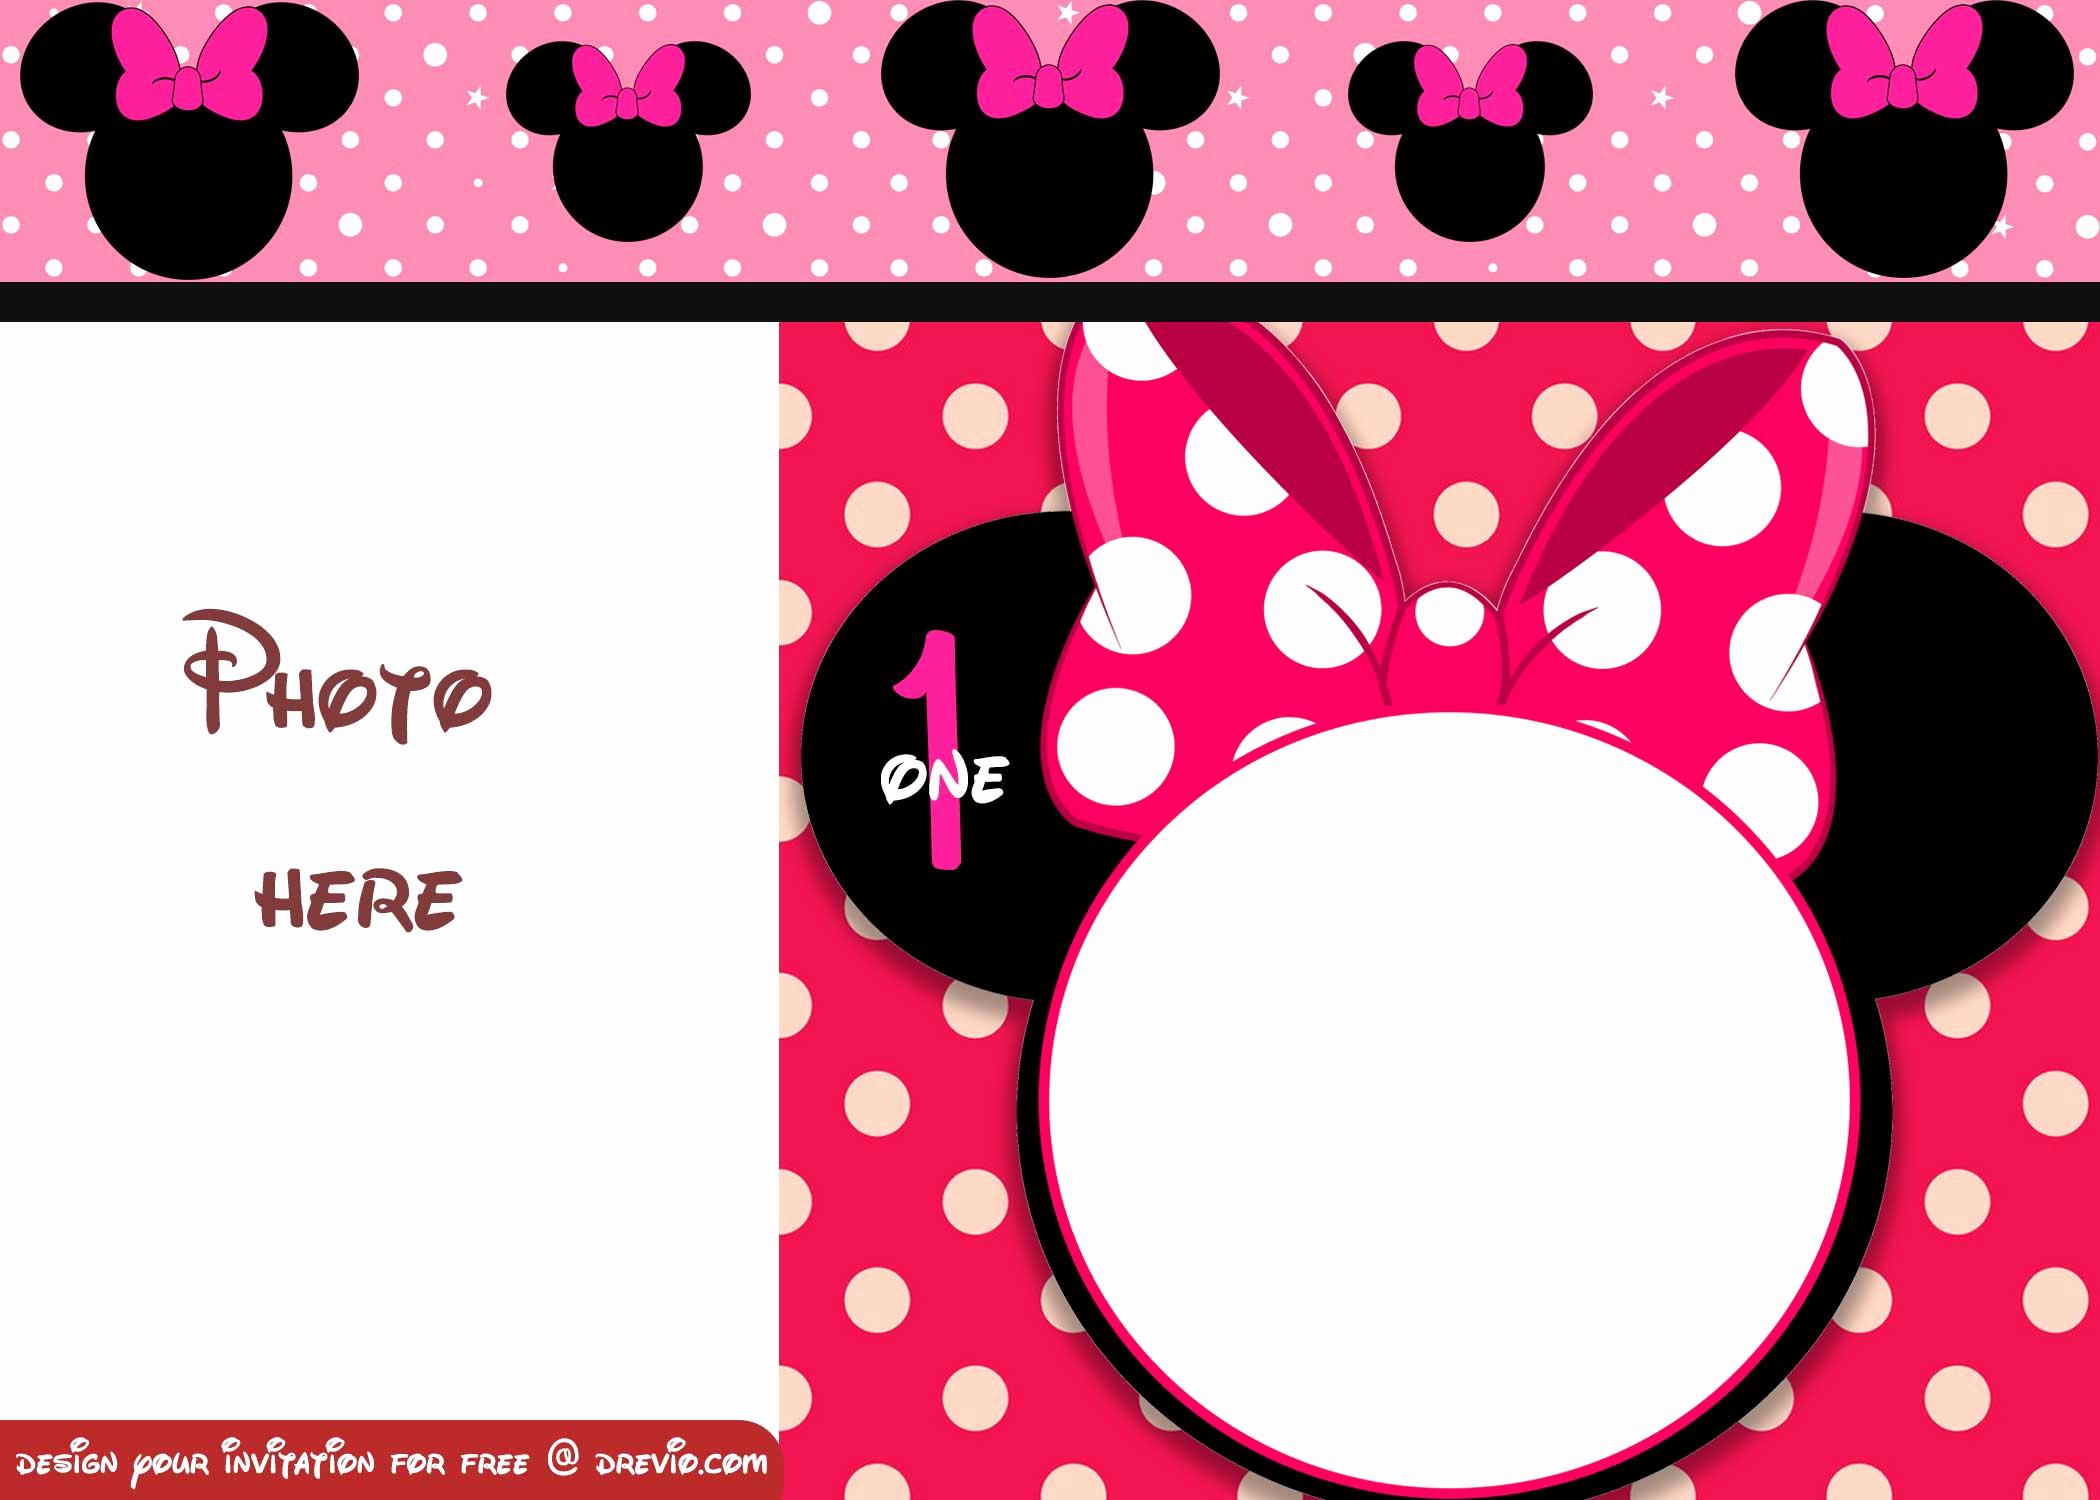 Minnie Mouse Invitation Template Elegant Free Minnie Mouse Polka Dot 1st Birthday Invitation